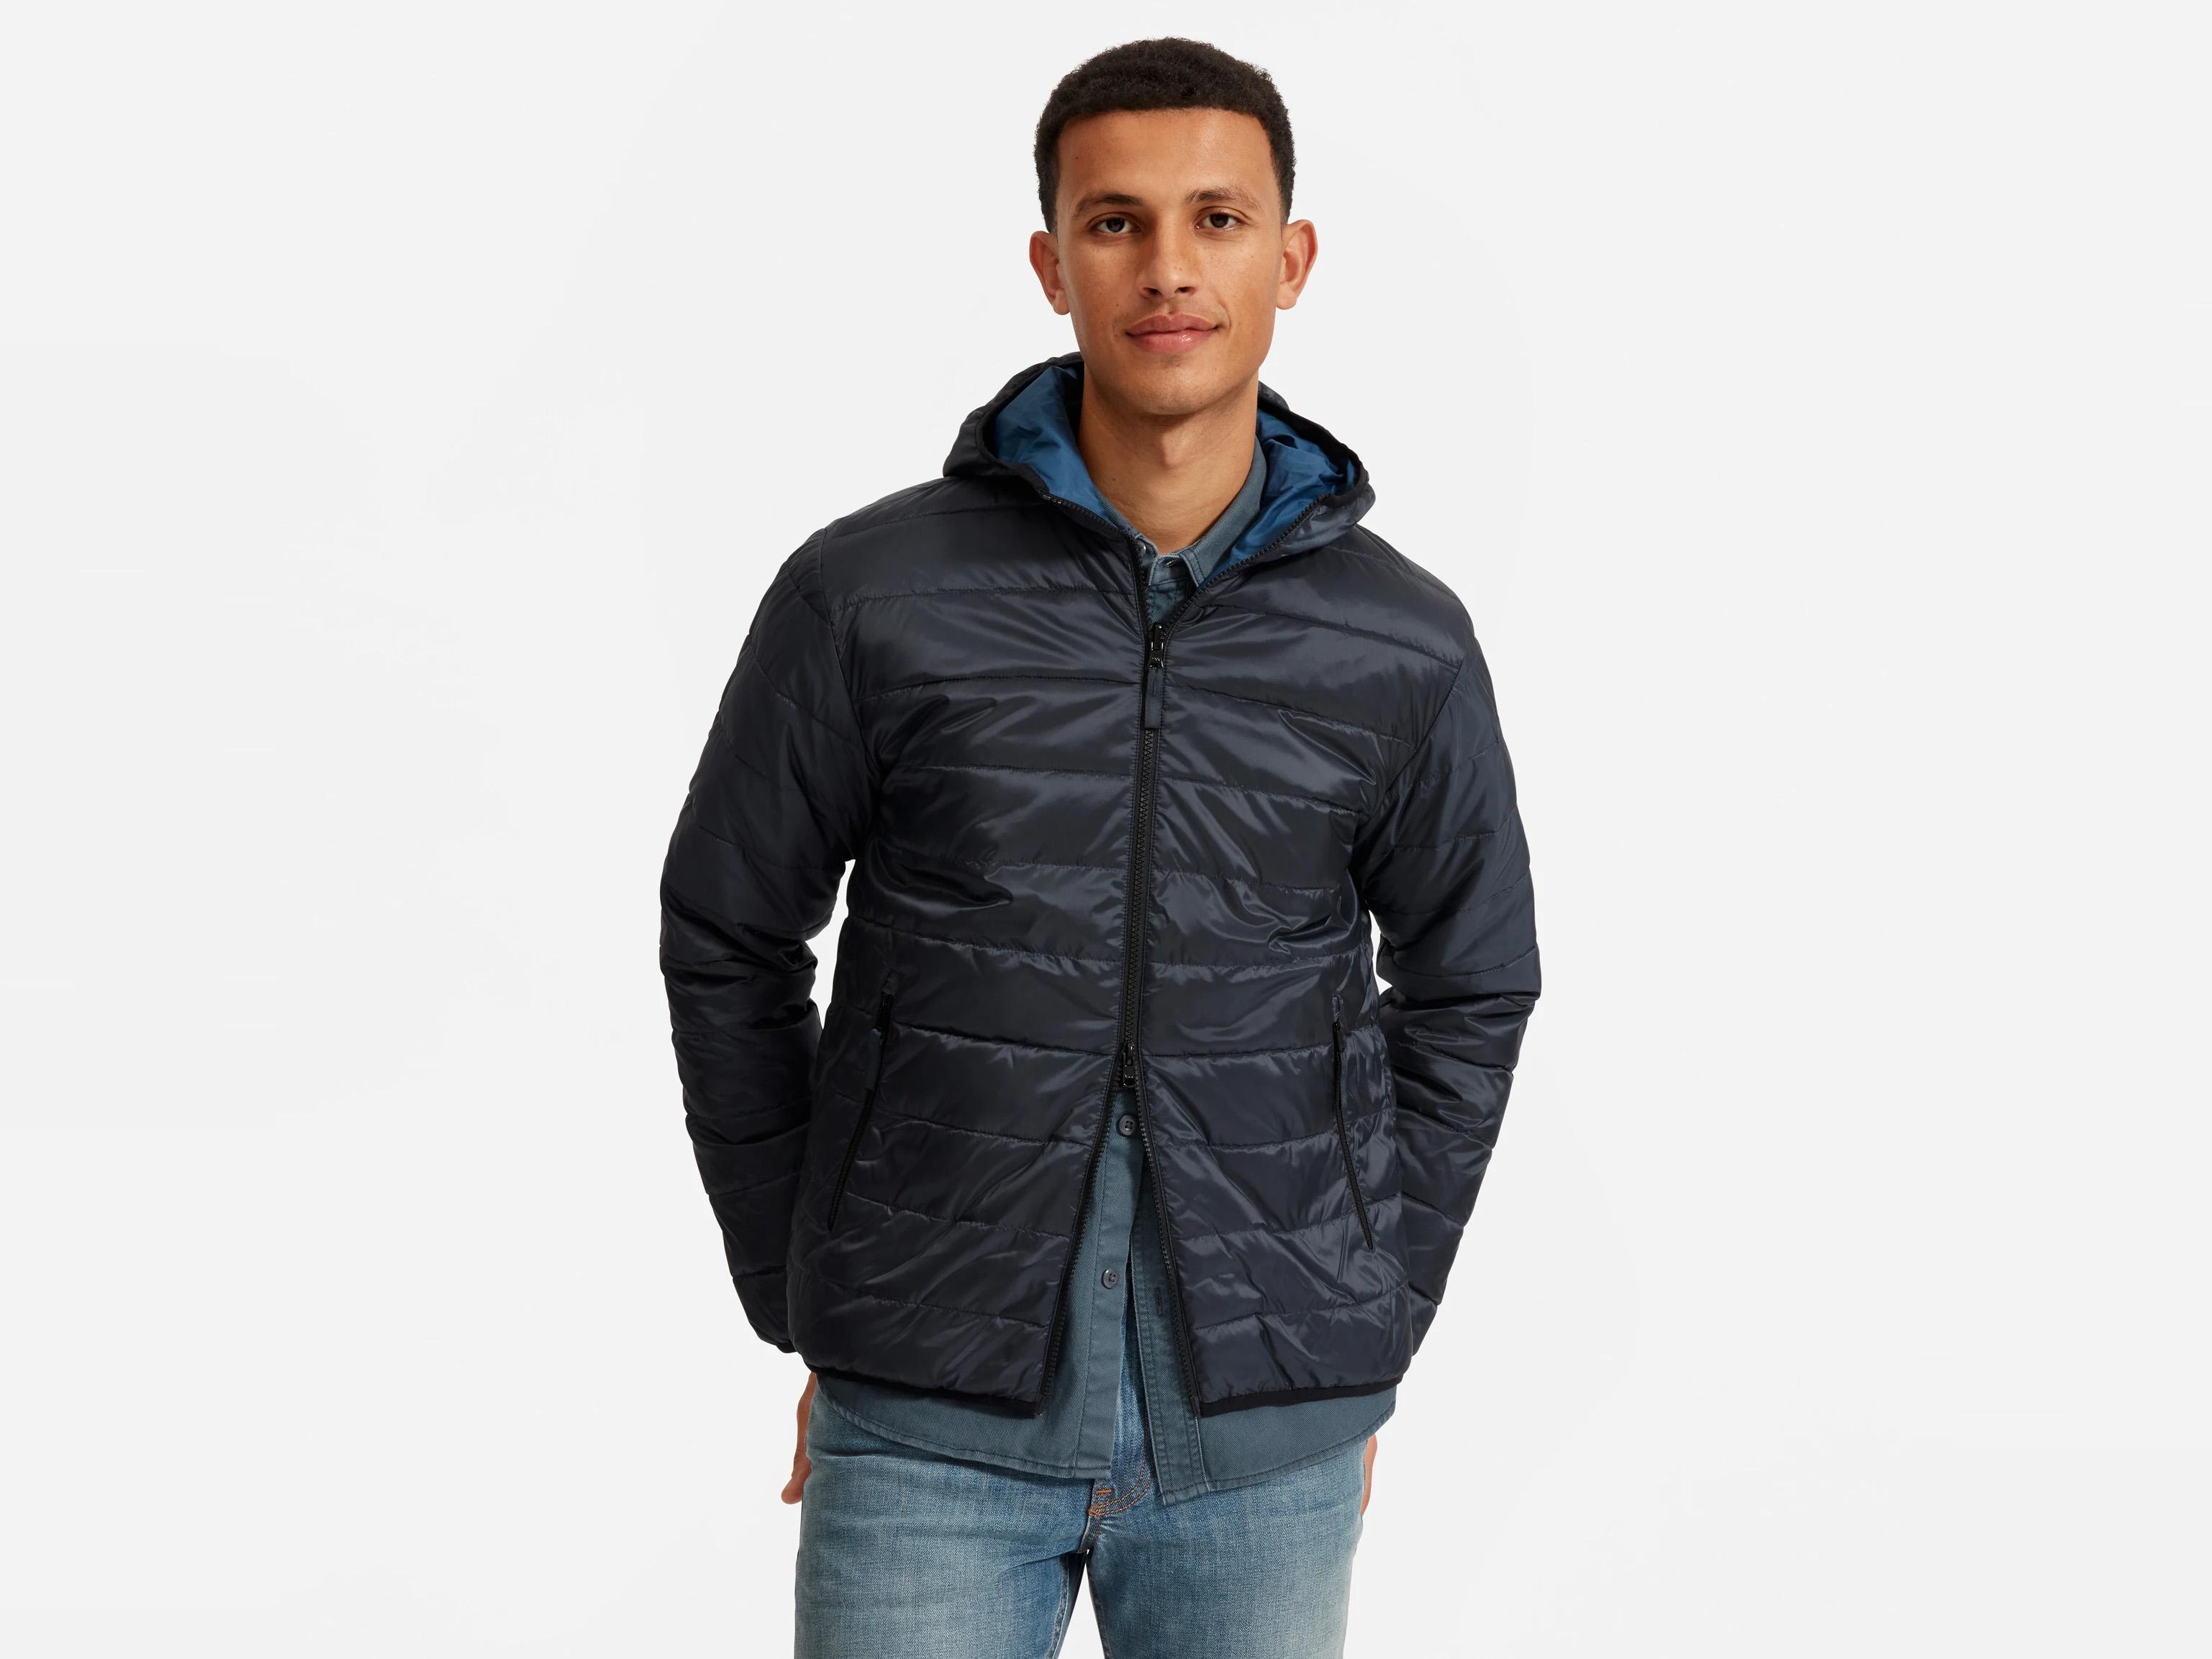 Best Men's Winter Jackets -Everlane